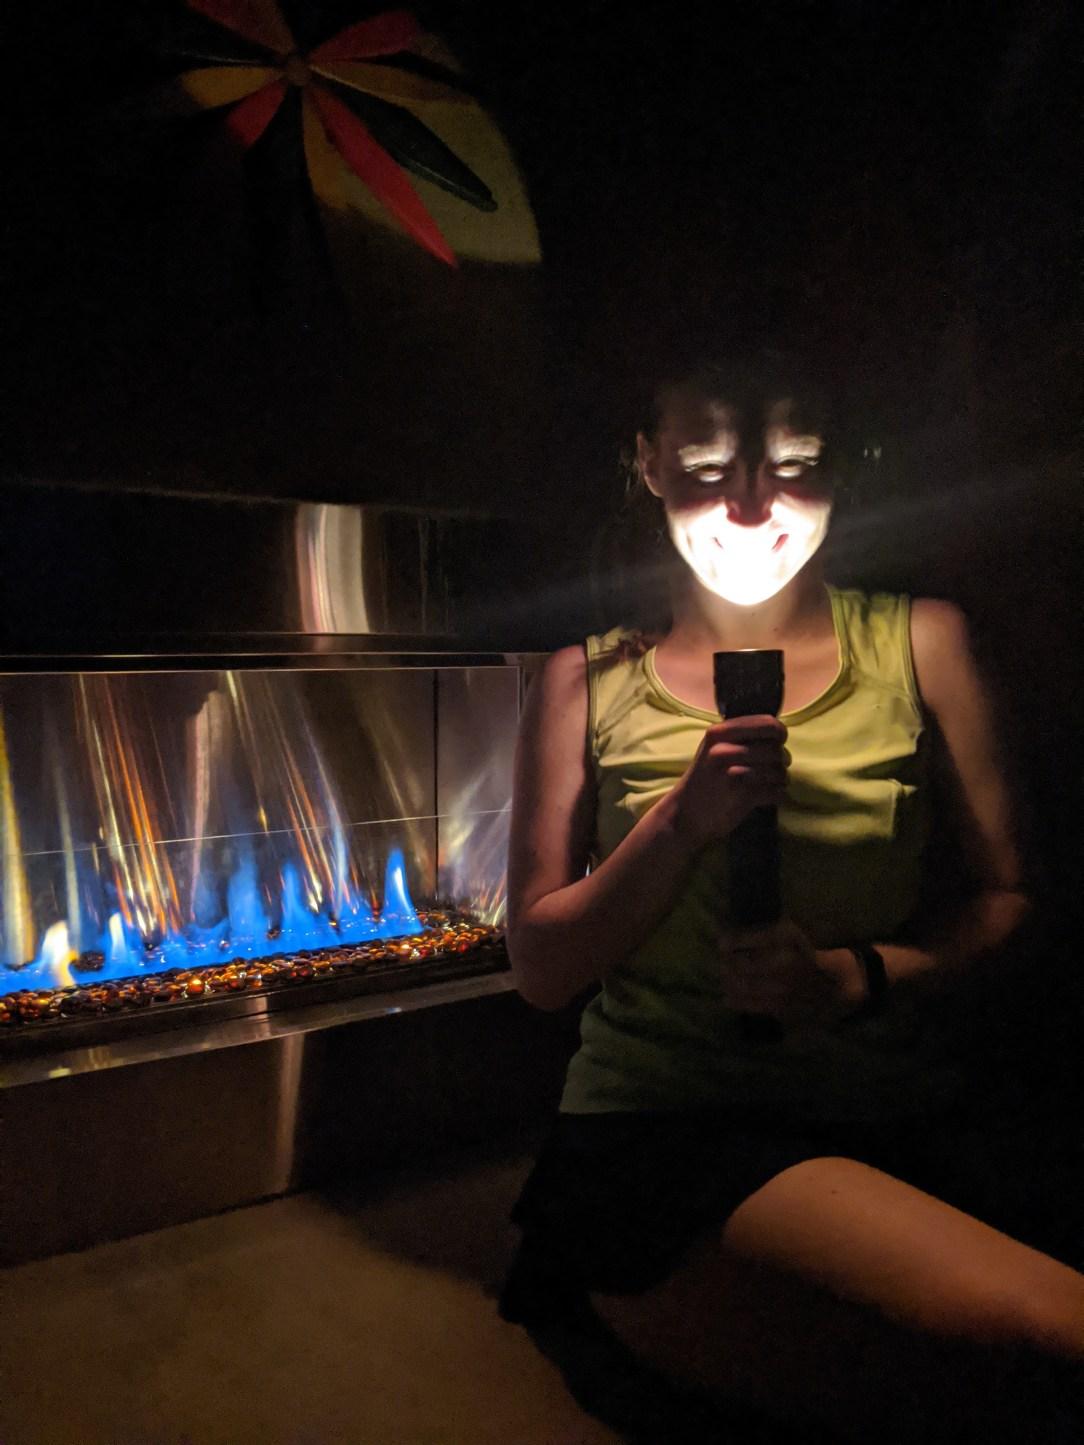 scary-stories-campfire-summer-nights-quarantine-activities